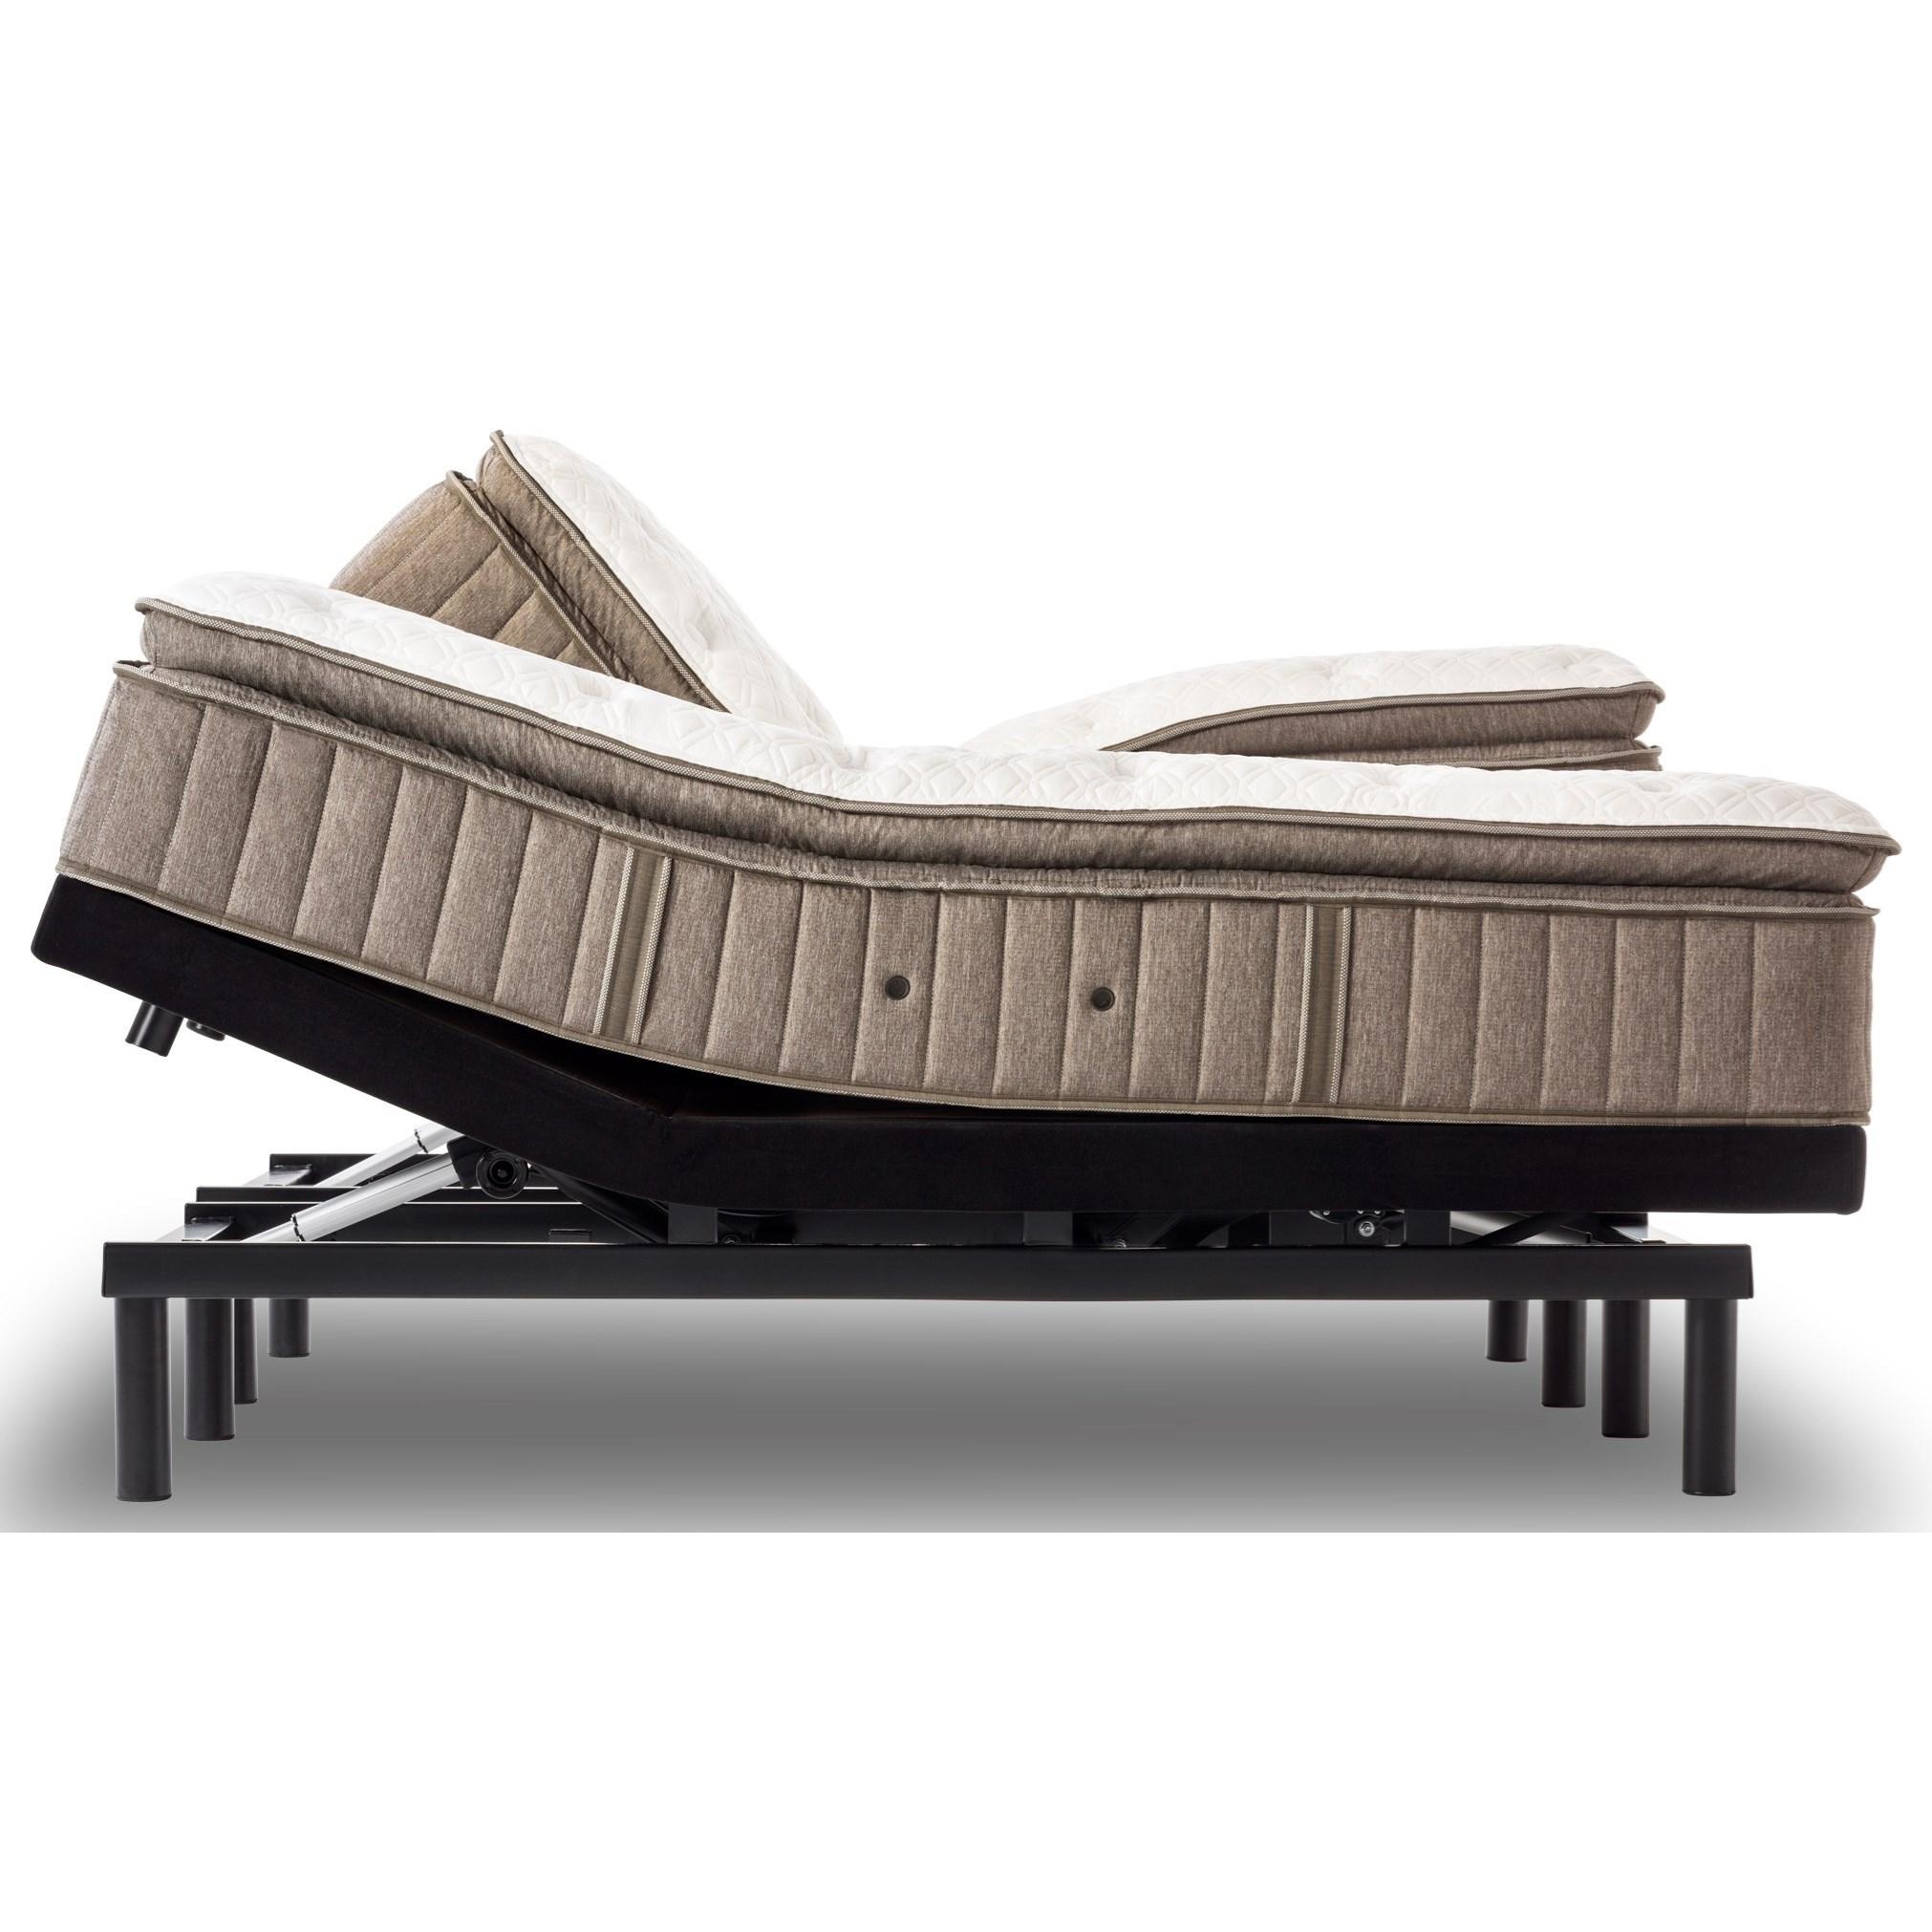 Stearns & Foster F2 Estate CF EPT 2016 Split King Cushion Firm Euro PT Adjustab Set - Item Number: 2xCushFirmEPT-TXL+2xEase-TXL